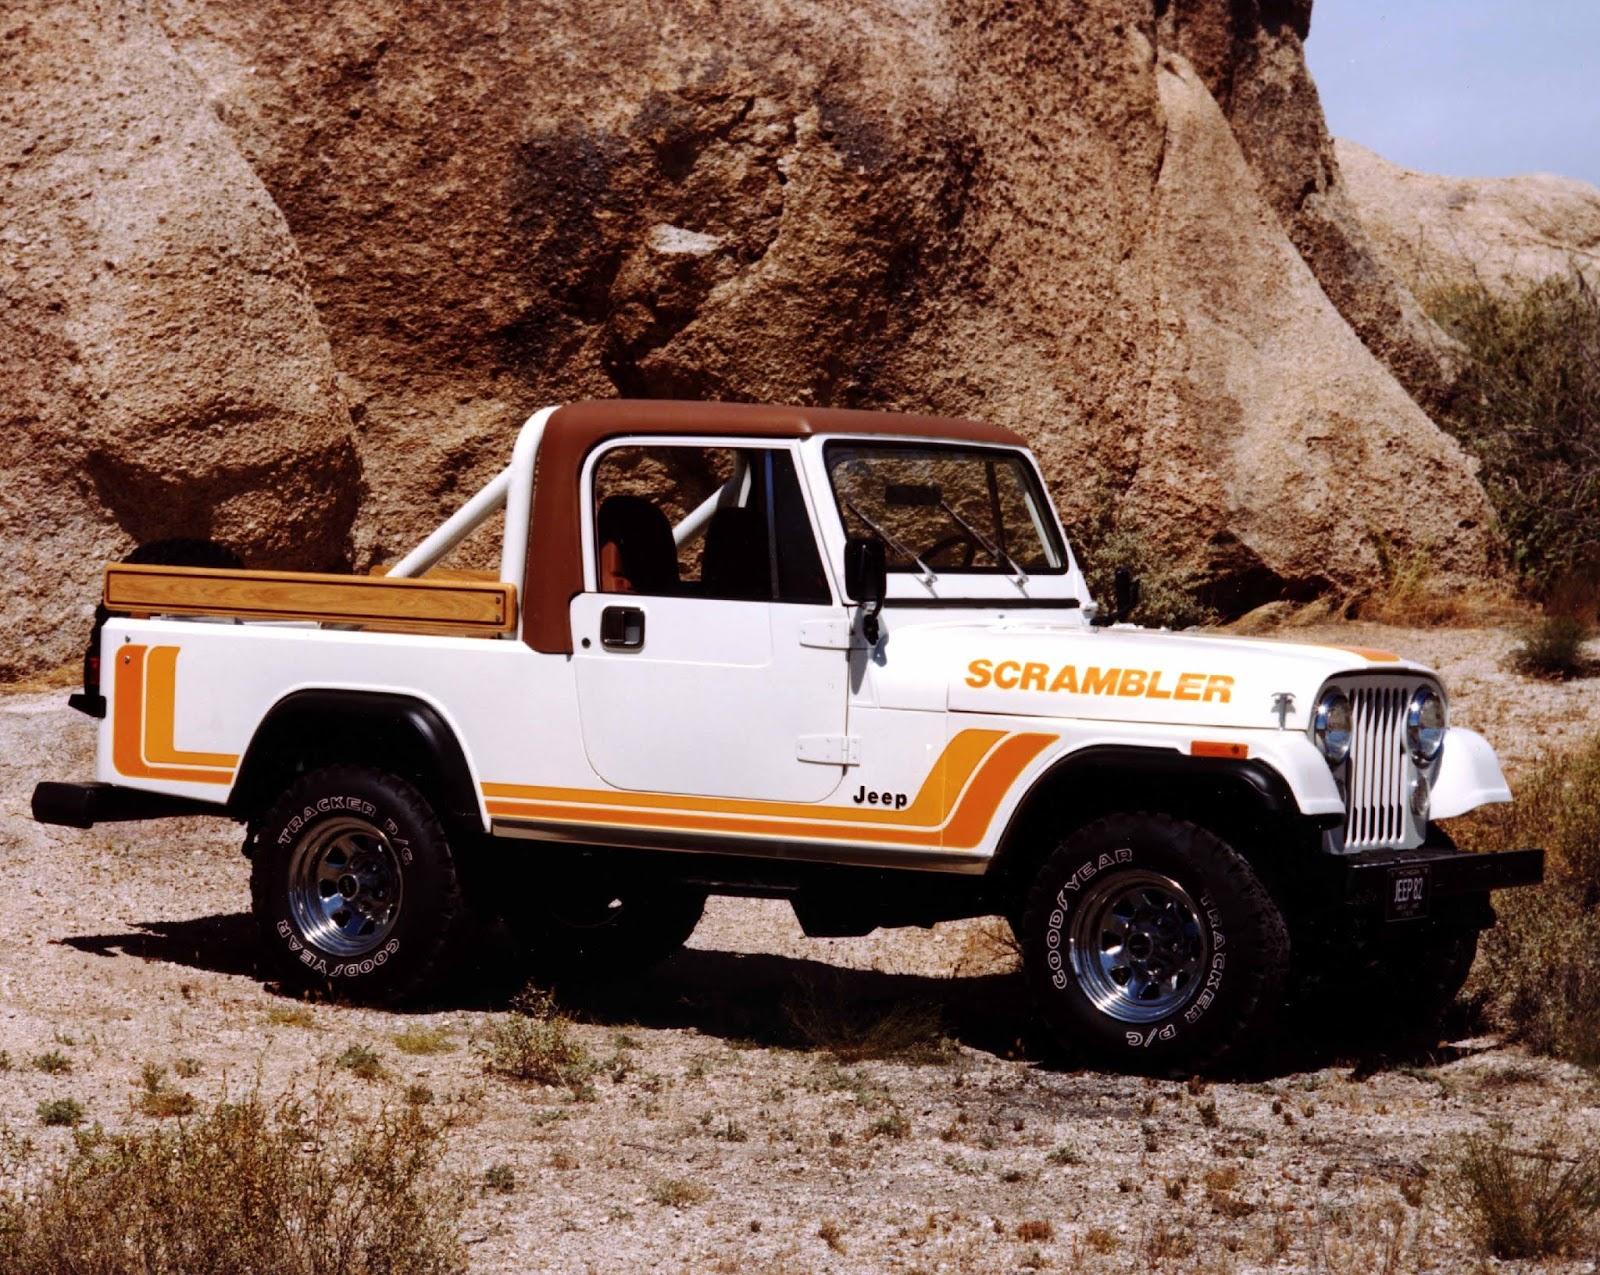 1982 Jeep CJ 8 Scrambler To Jeep Gladiator, έρχεται να αλλάξει τα δεδομένα στην κατηγορία των pick-up Gladiator, Jeep, Jeep Gladiator, zblog, ειδήσεις